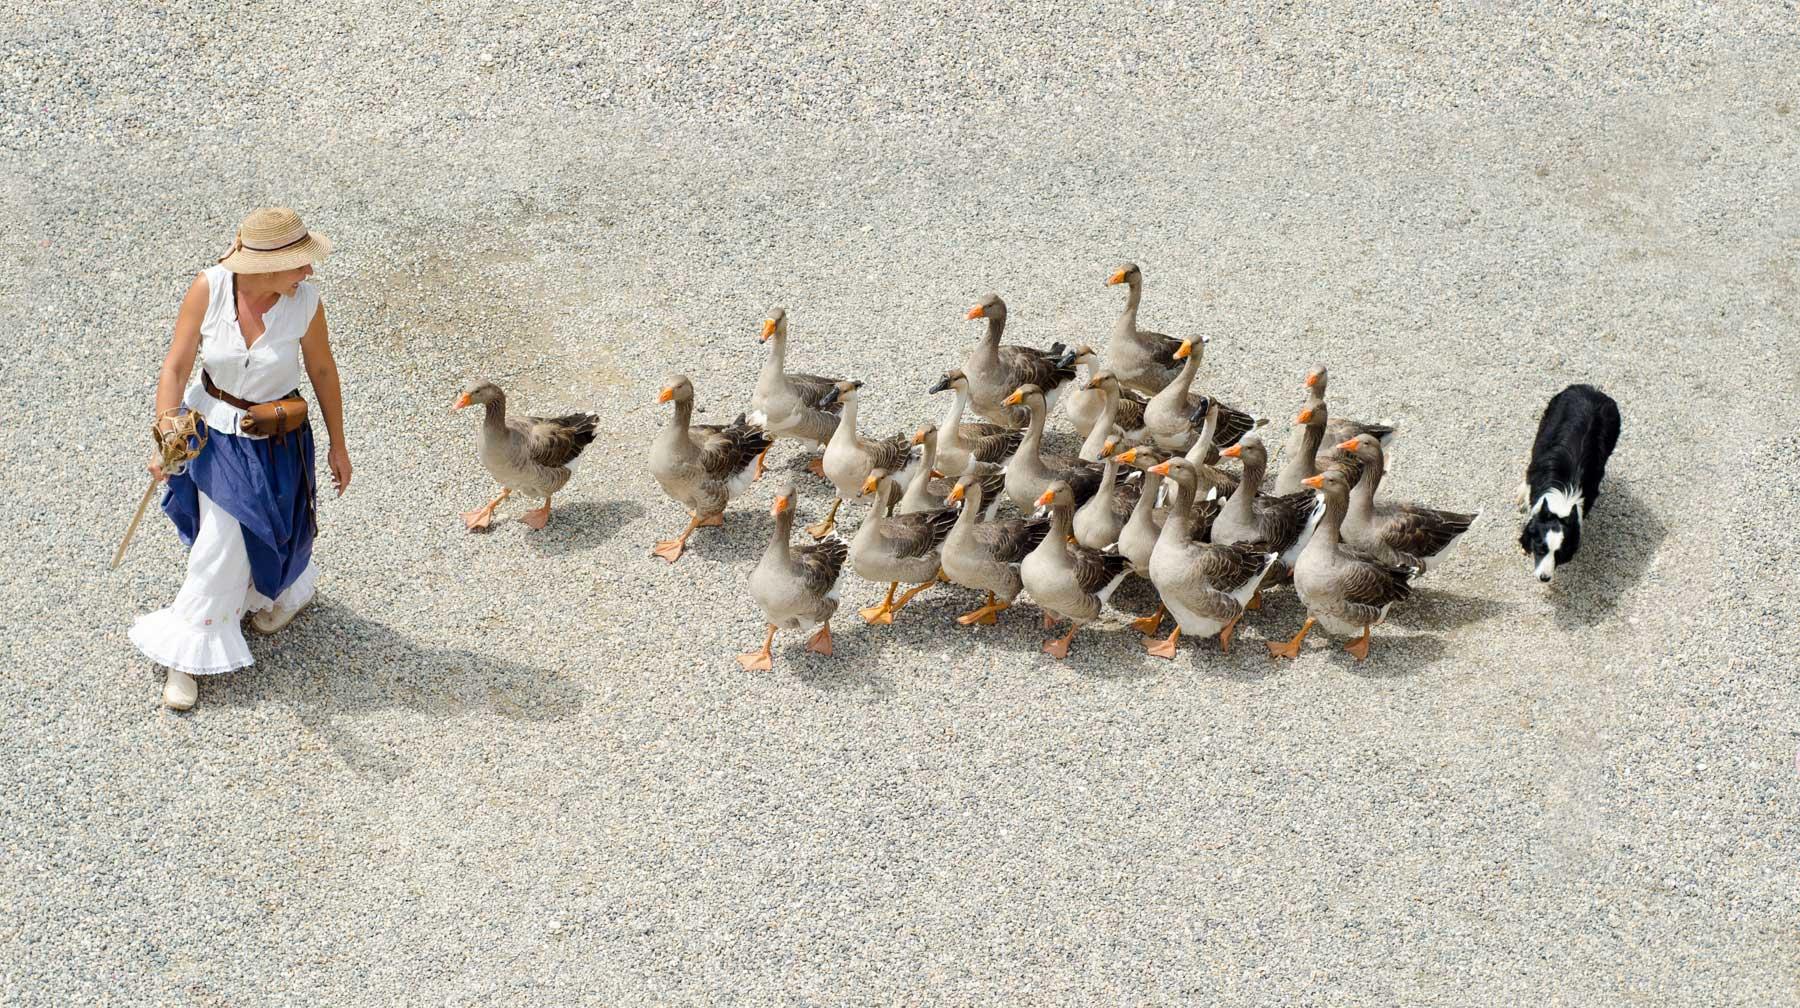 Goose herding